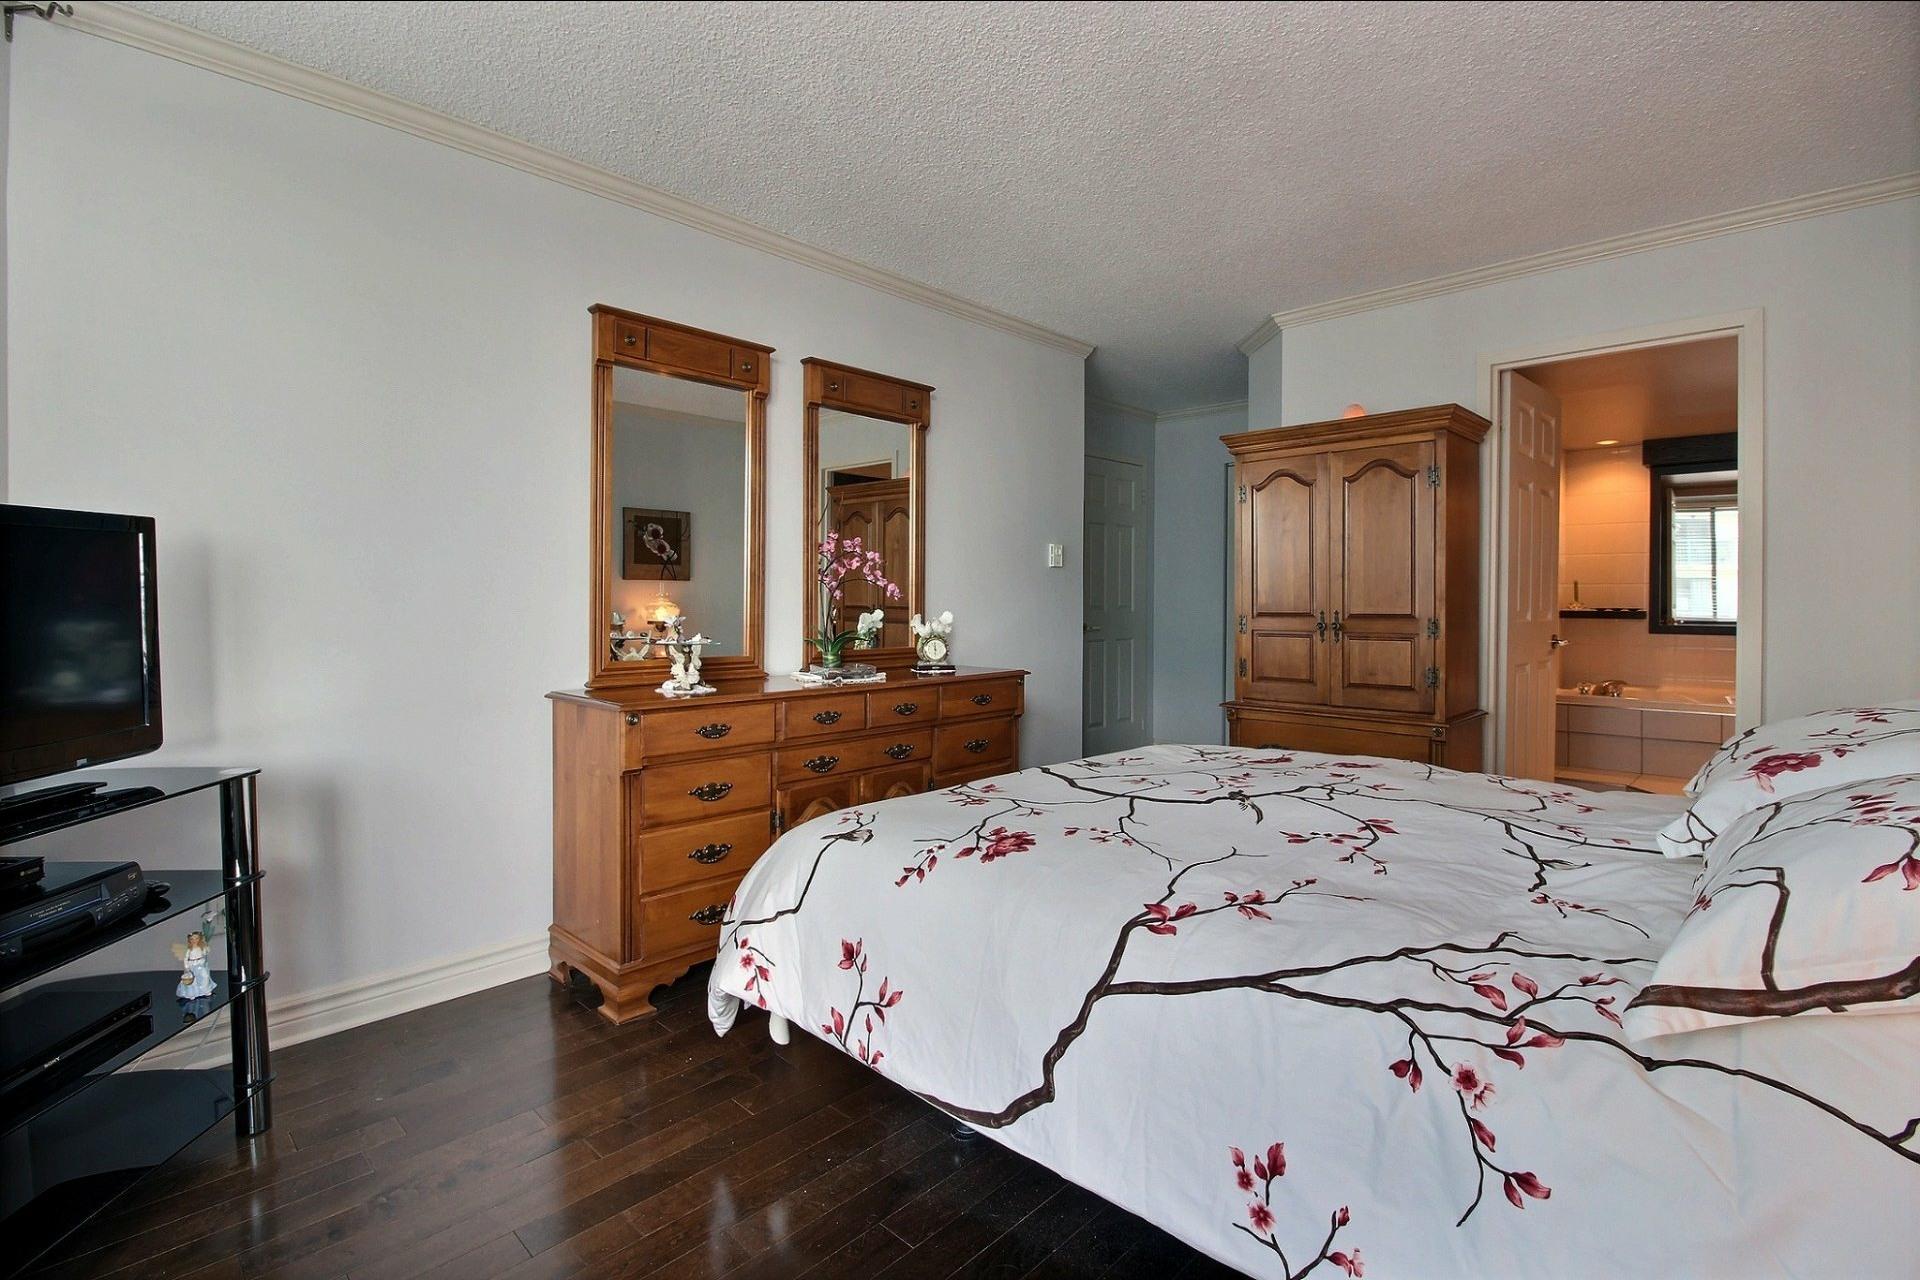 image 12 - Appartement À vendre Repentigny Repentigny  - 5 pièces